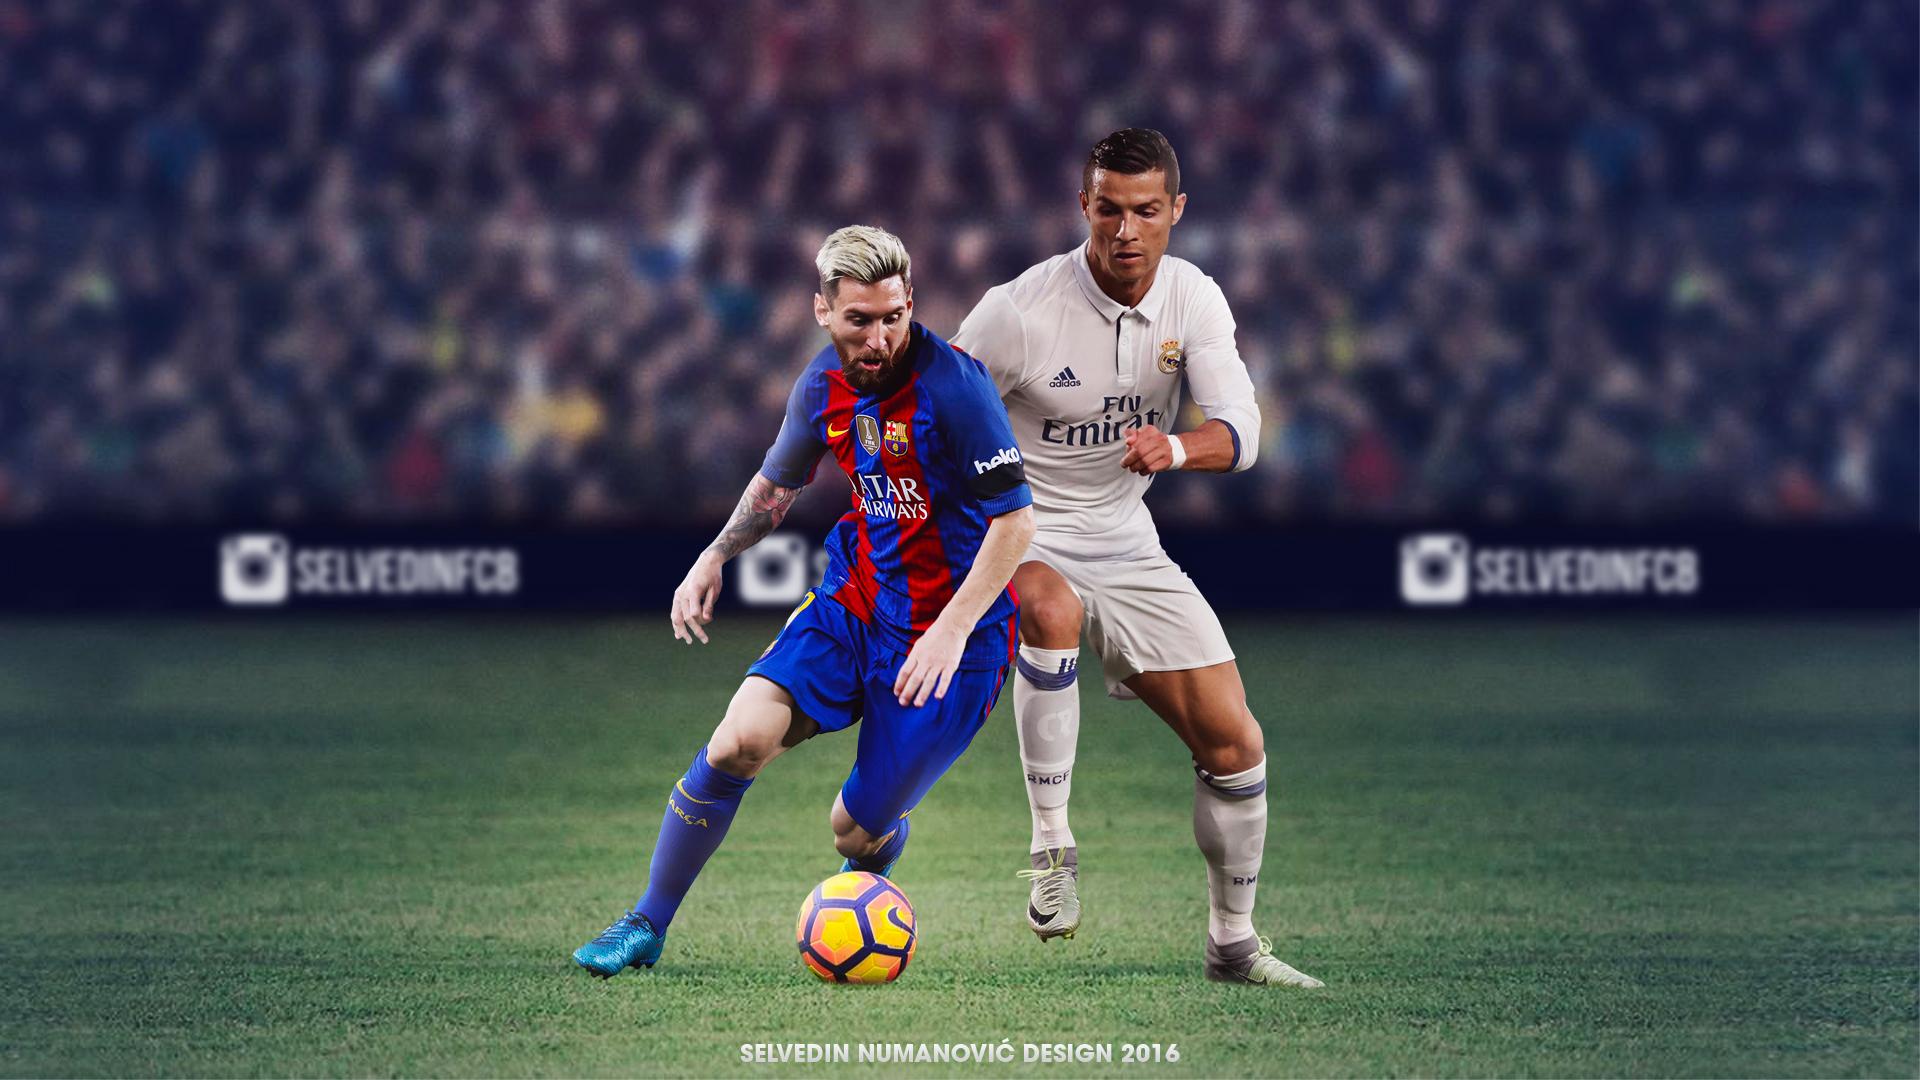 Messi vs ronaldo hd wallpaper by selvedinfcb on deviantart messi vs ronaldo hd wallpaper by selvedinfcb voltagebd Images